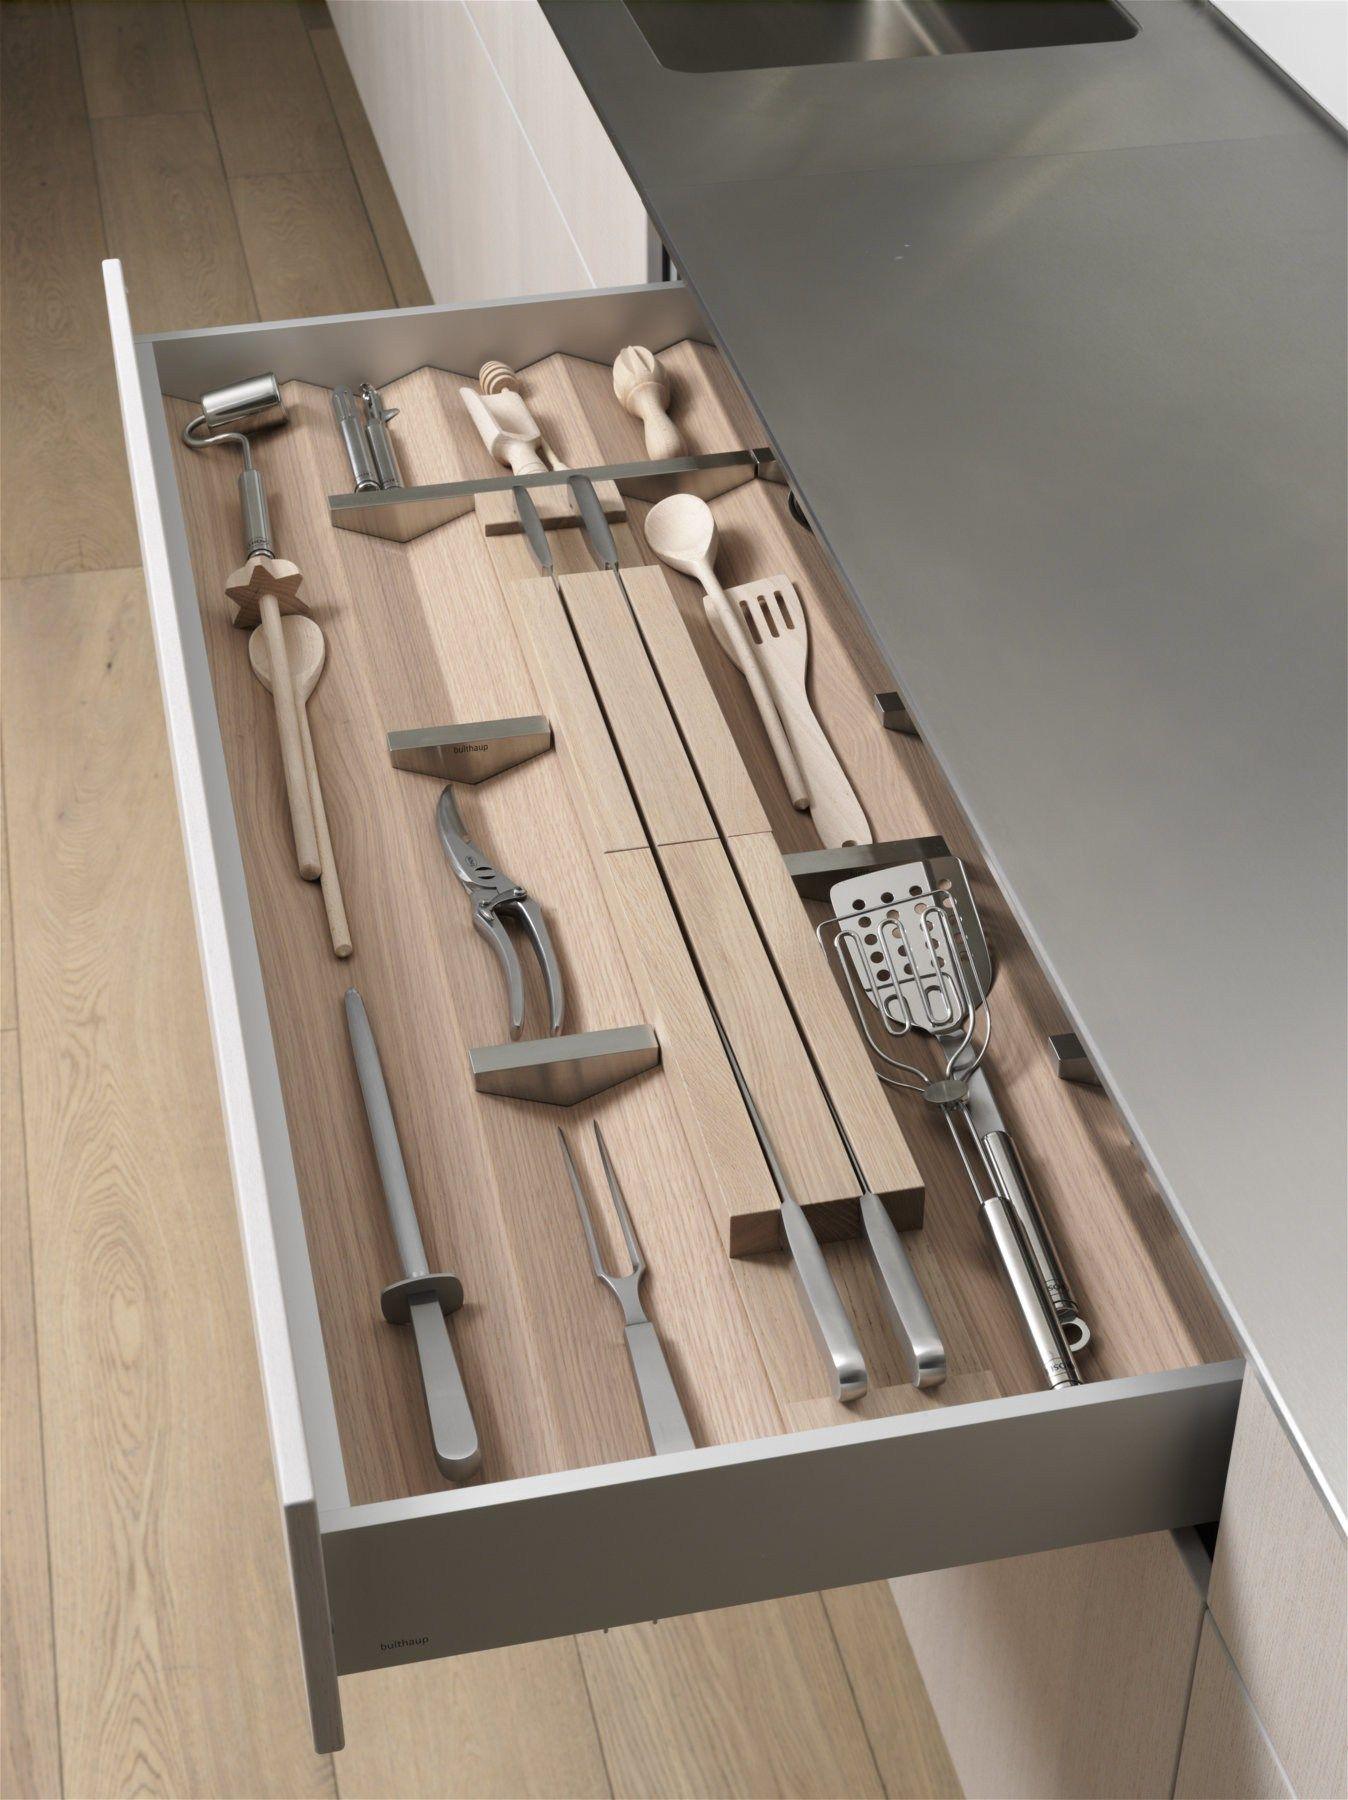 Separador de cajoneras de madera soporte para cuchillos de - Separador de madera ...